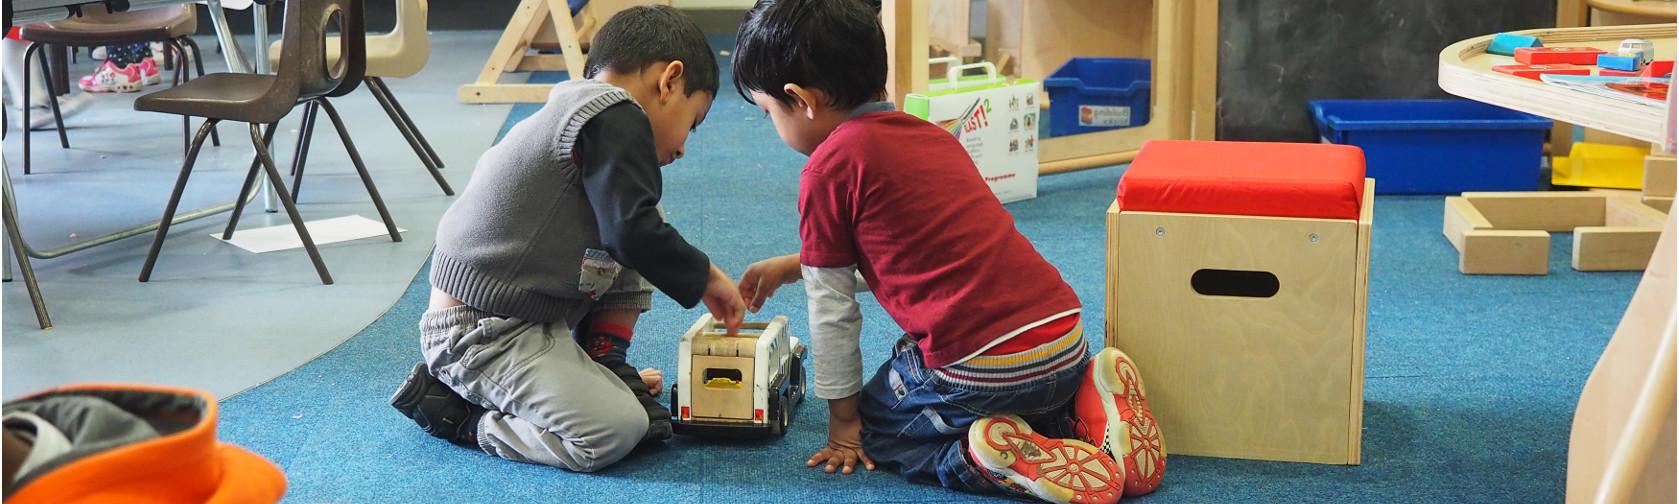 Nursery - Howes Primary School